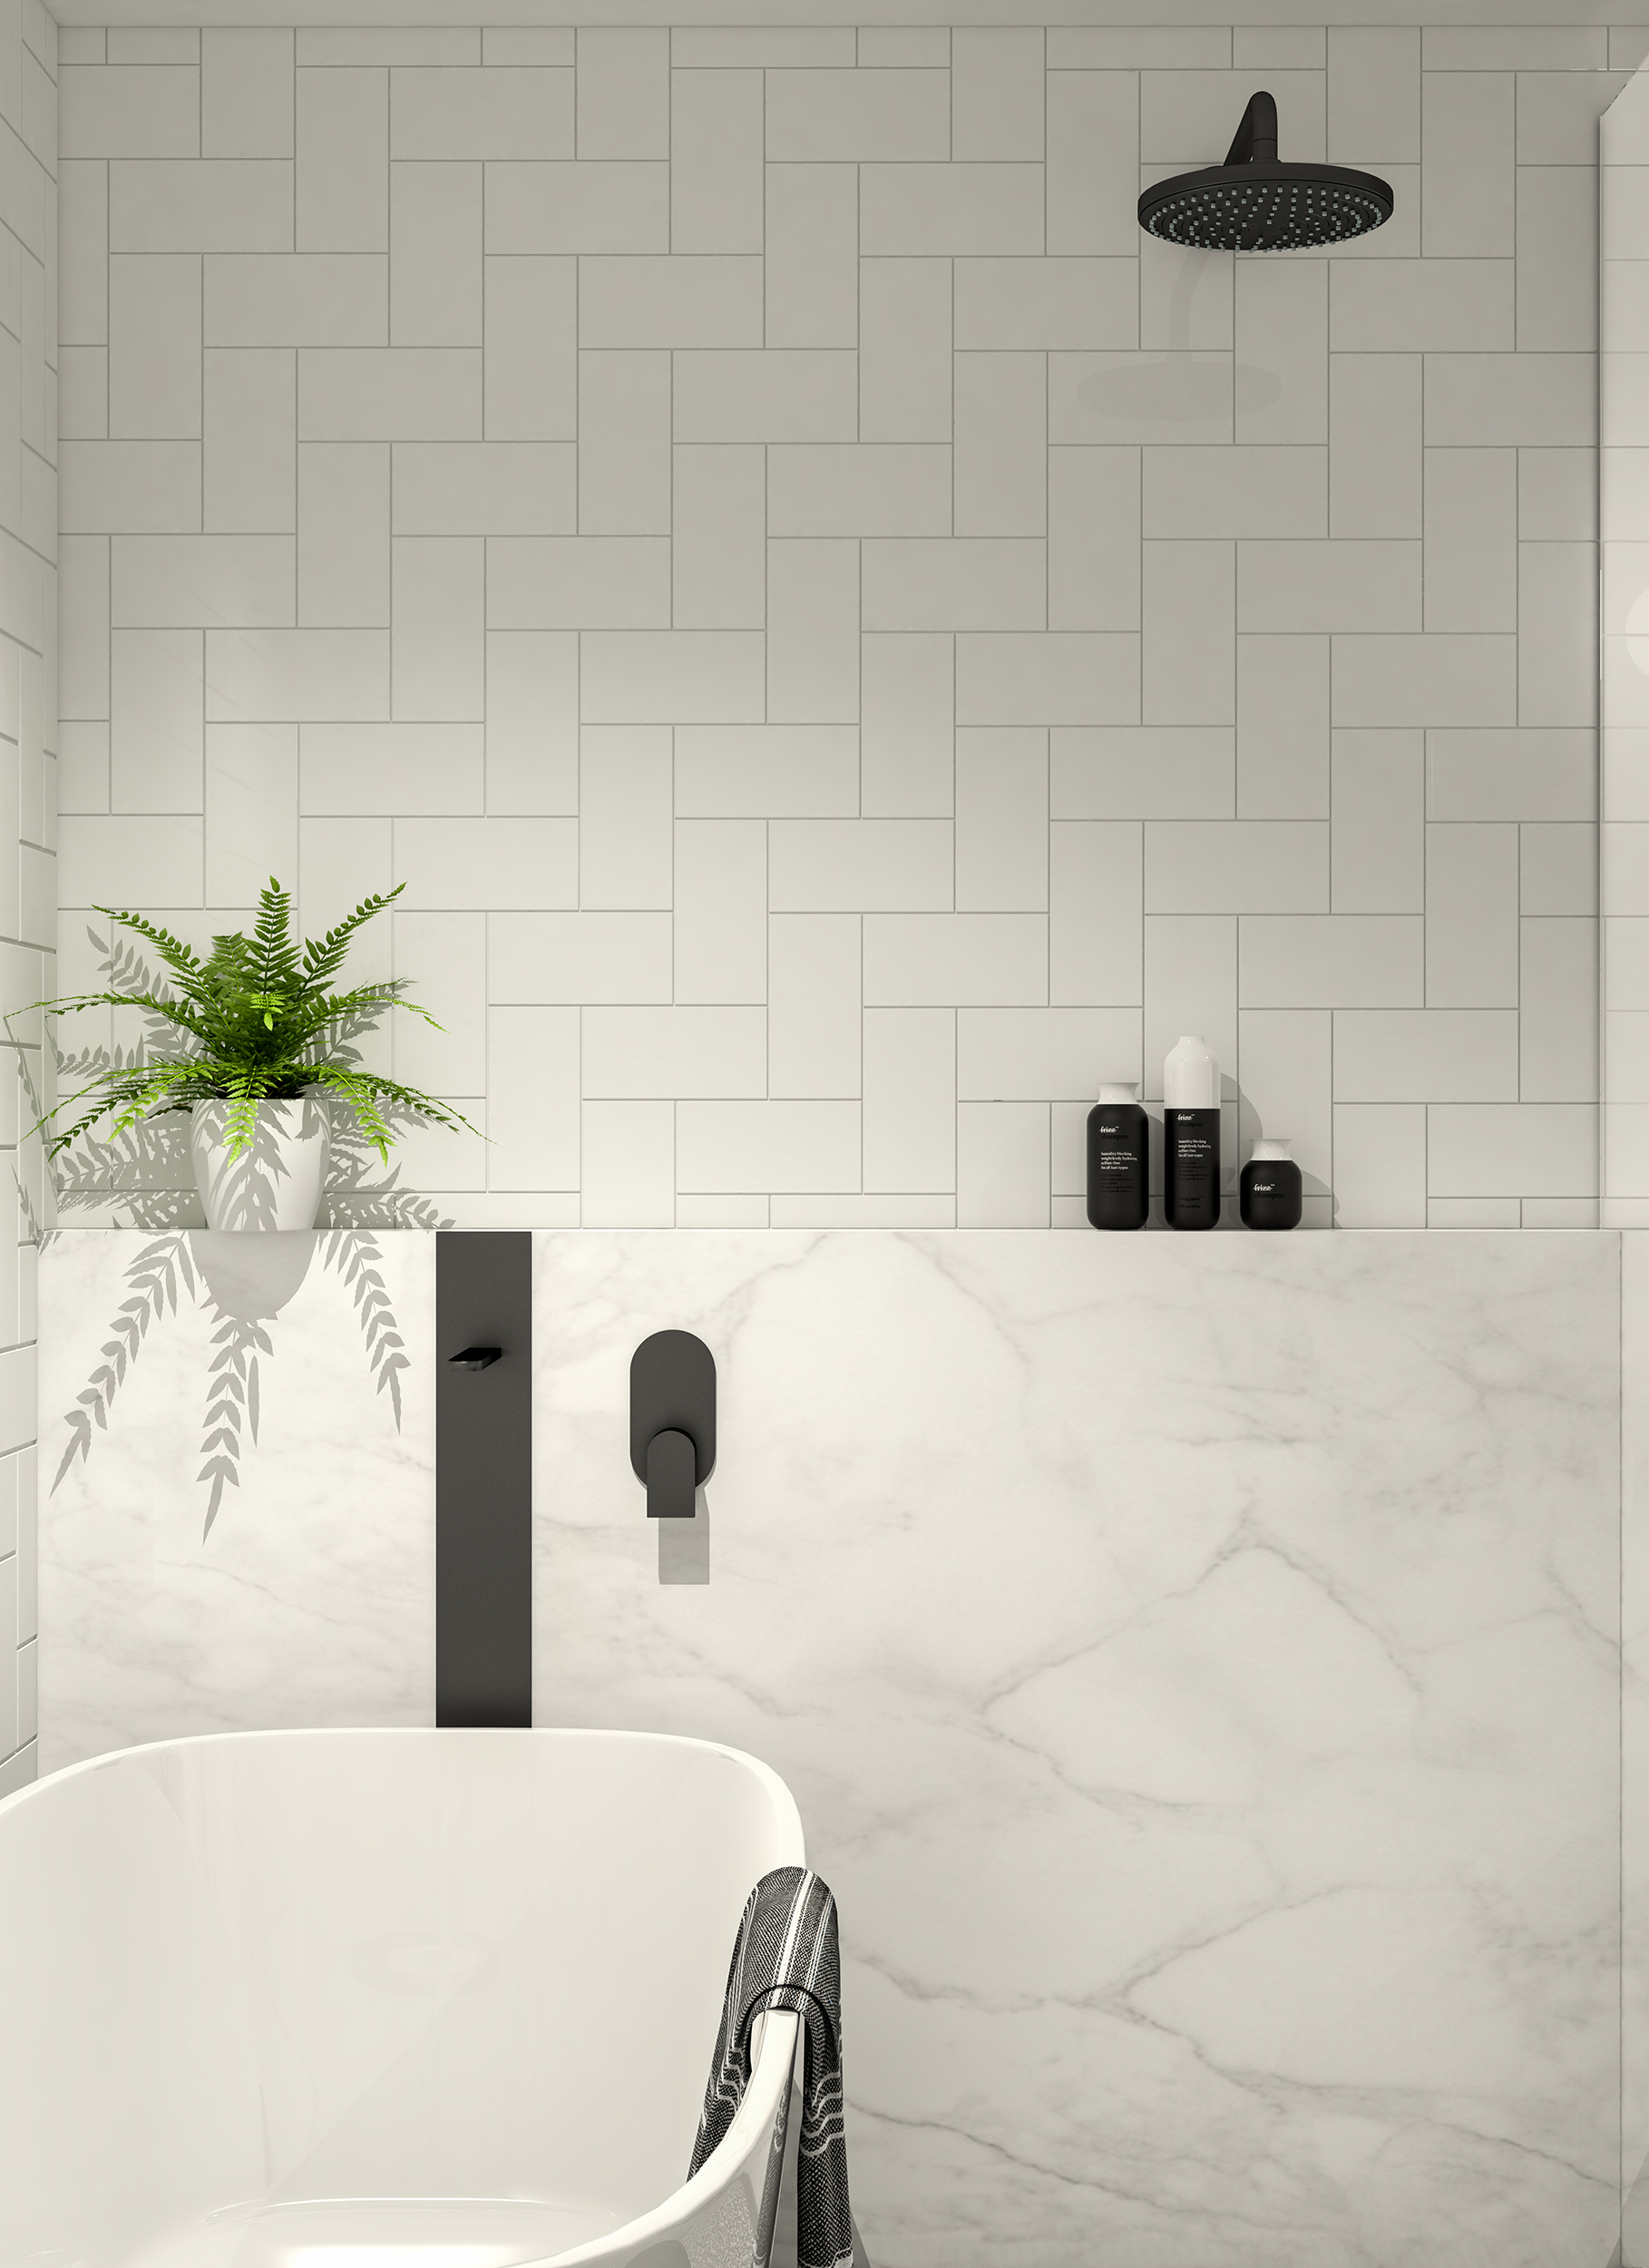 Well St - Apartment 1 - Bathroom Detail 1 - Light Scheme MR.jpg